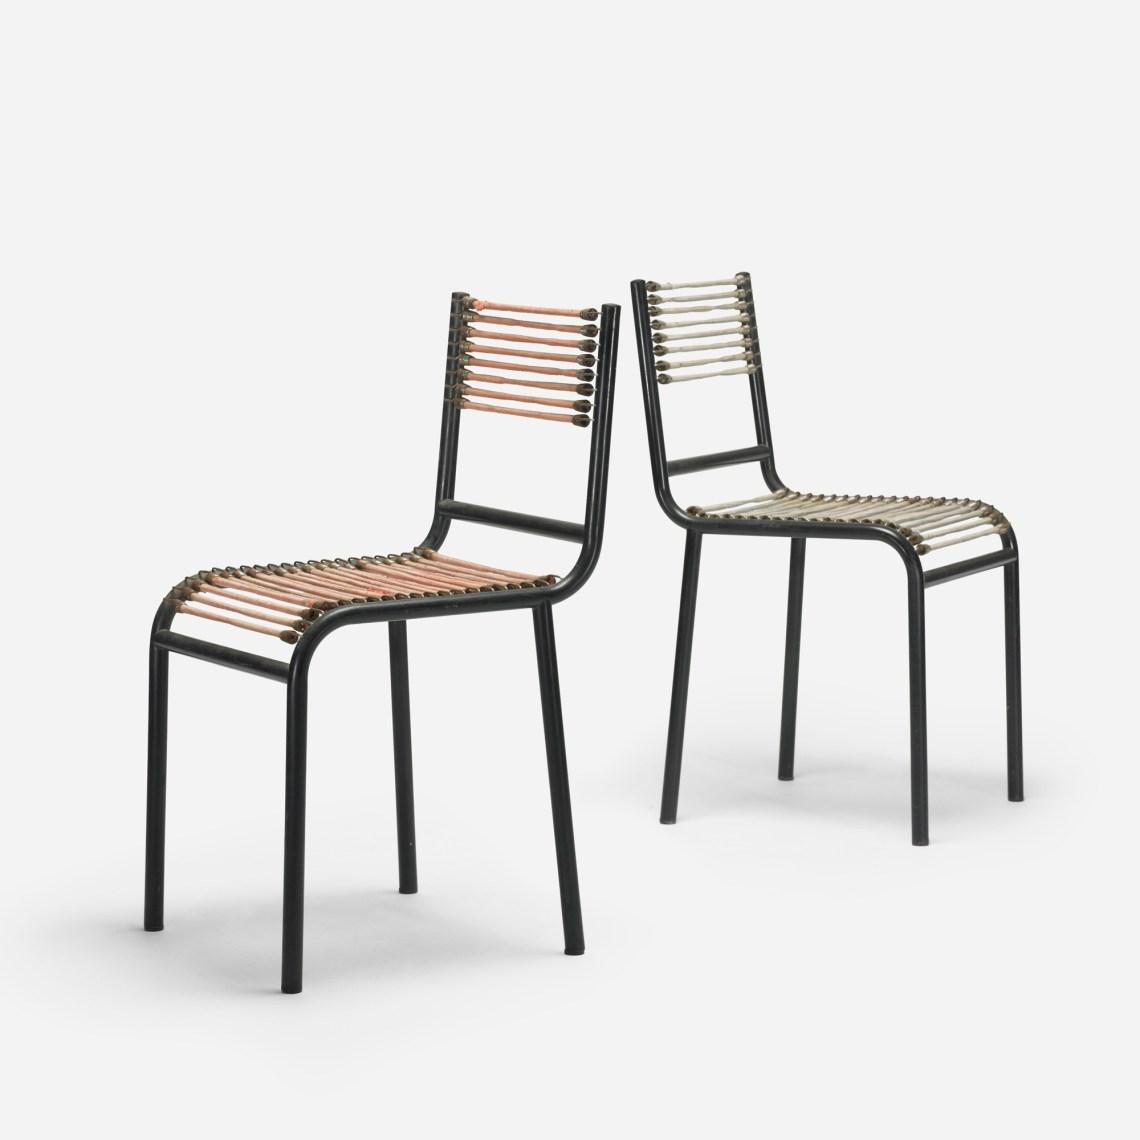 300_1_mass_modern_july_2012_rene_herbst_sandows_chairs_pair__wright_auction.jpg